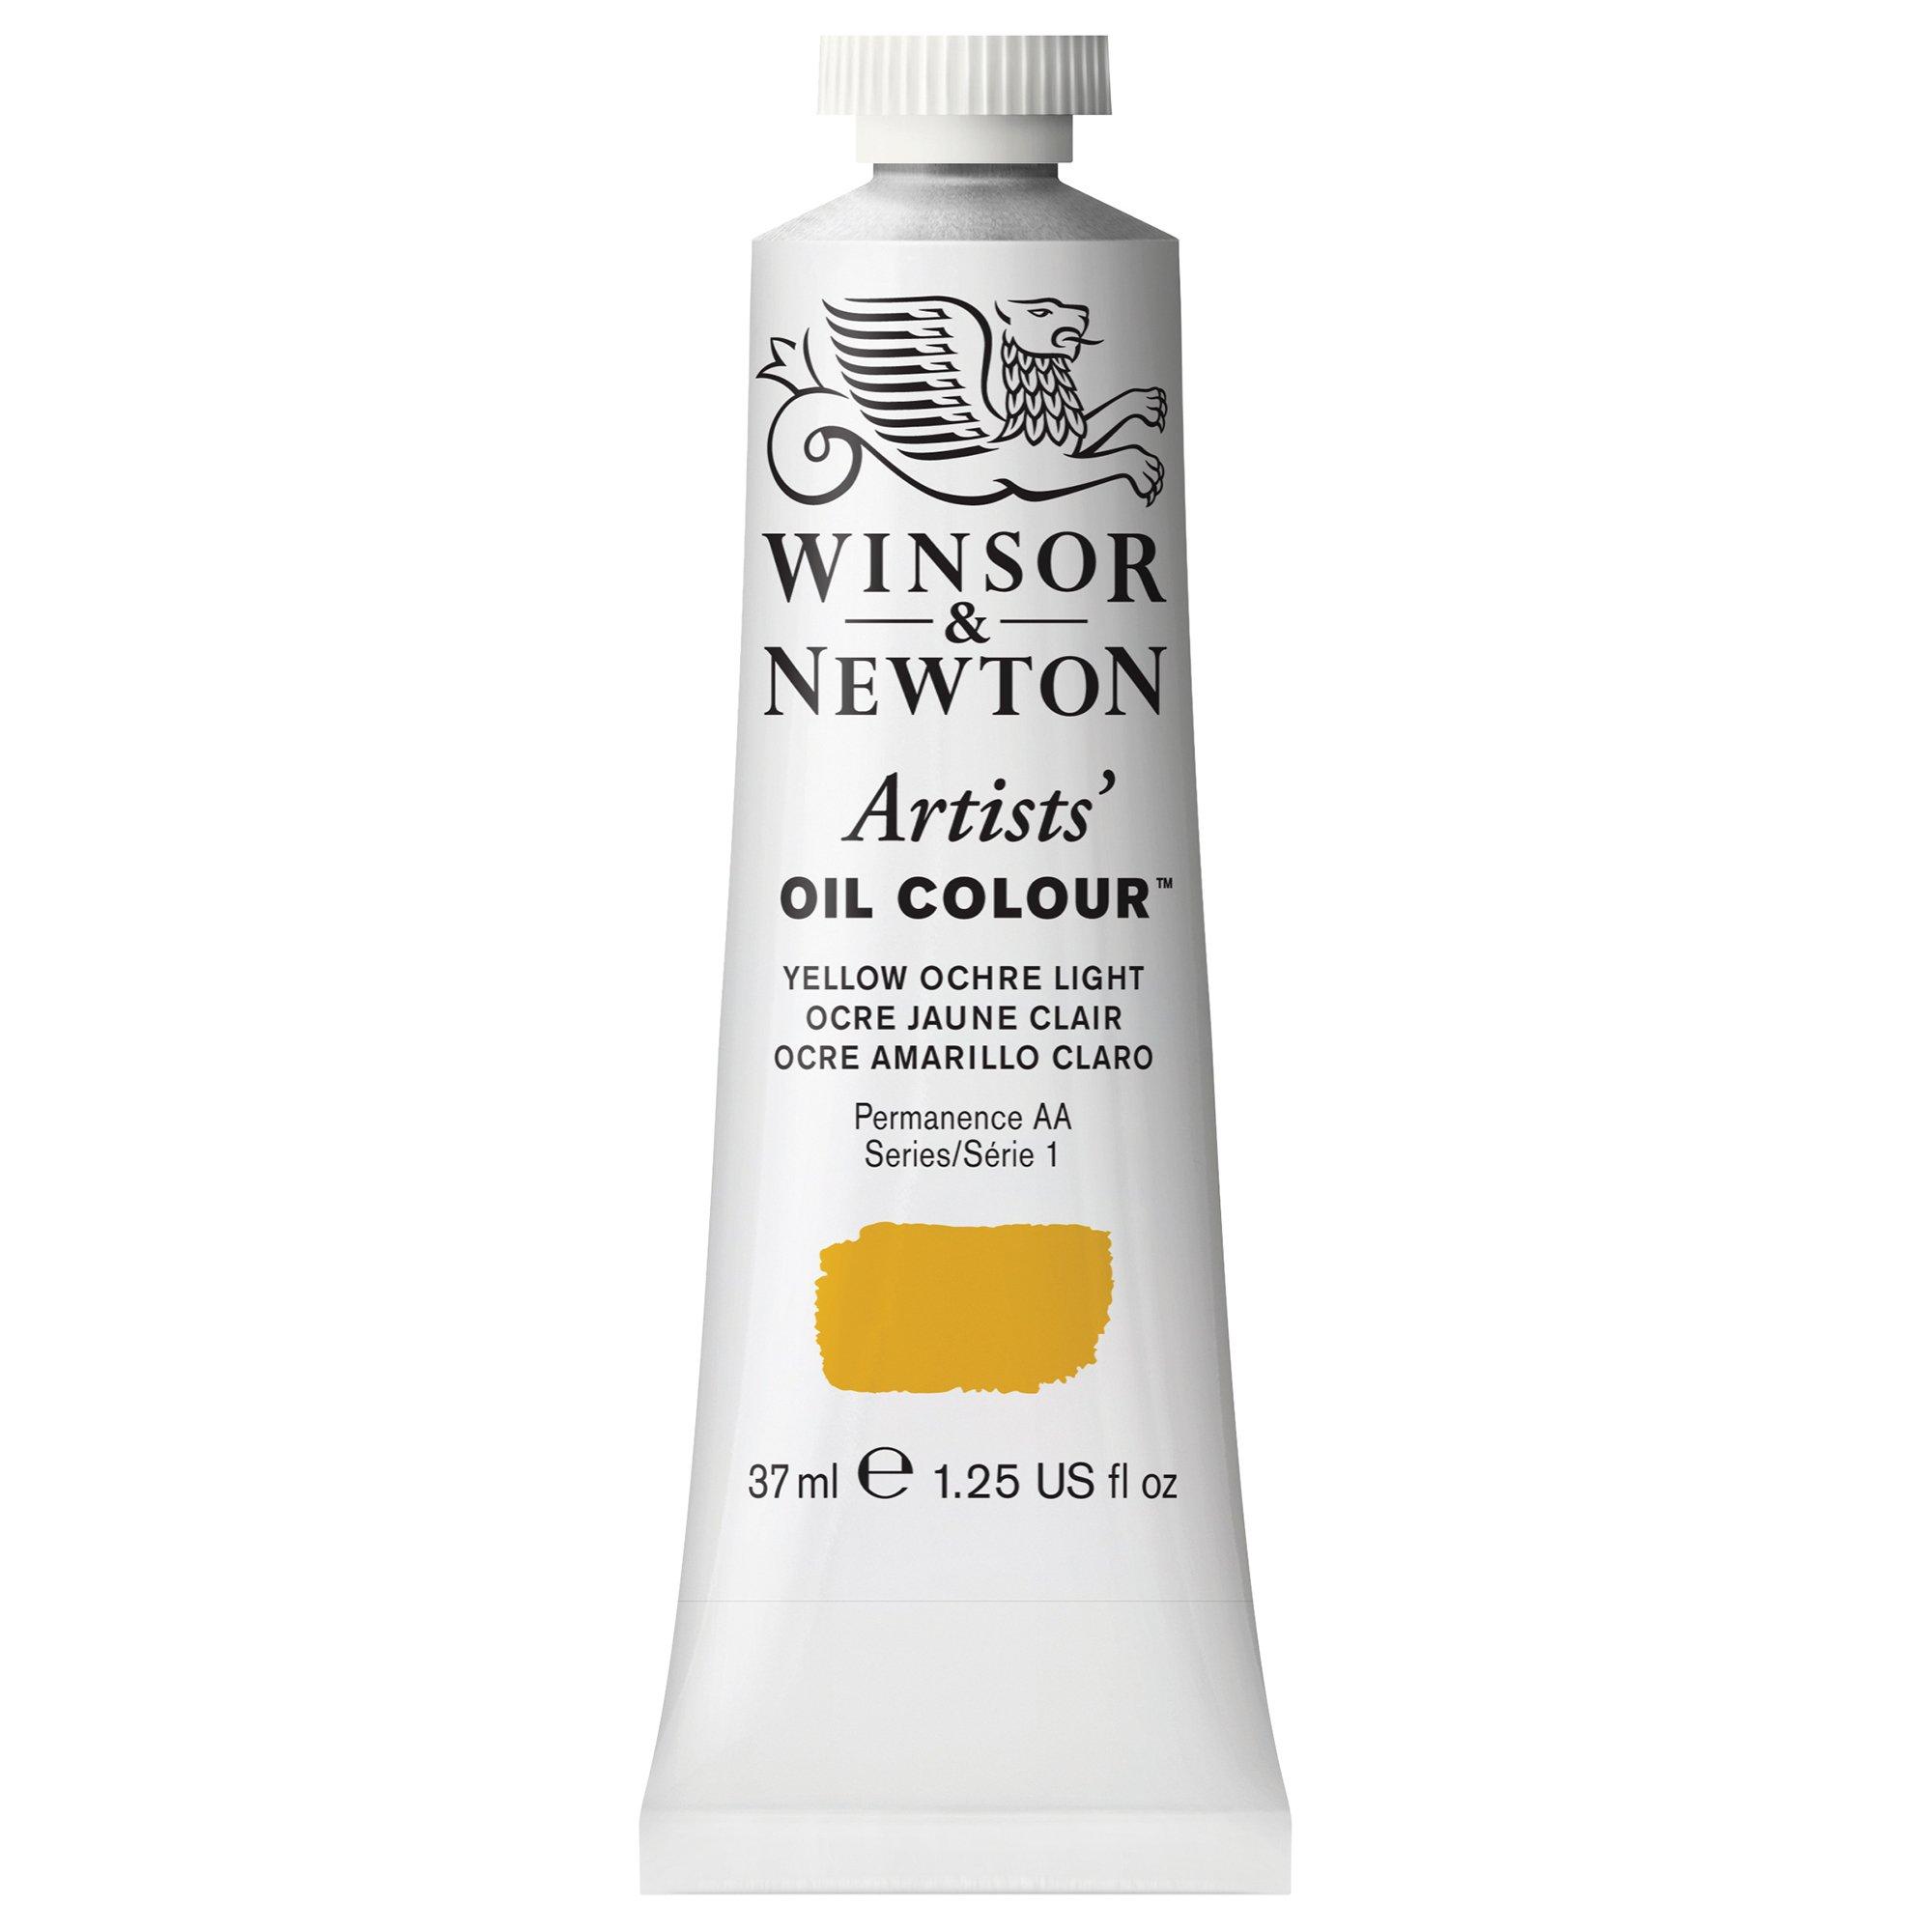 Winsor & Newton Artists' Oil Colour Paint, 37ml Tube, Yellow Ochre Light